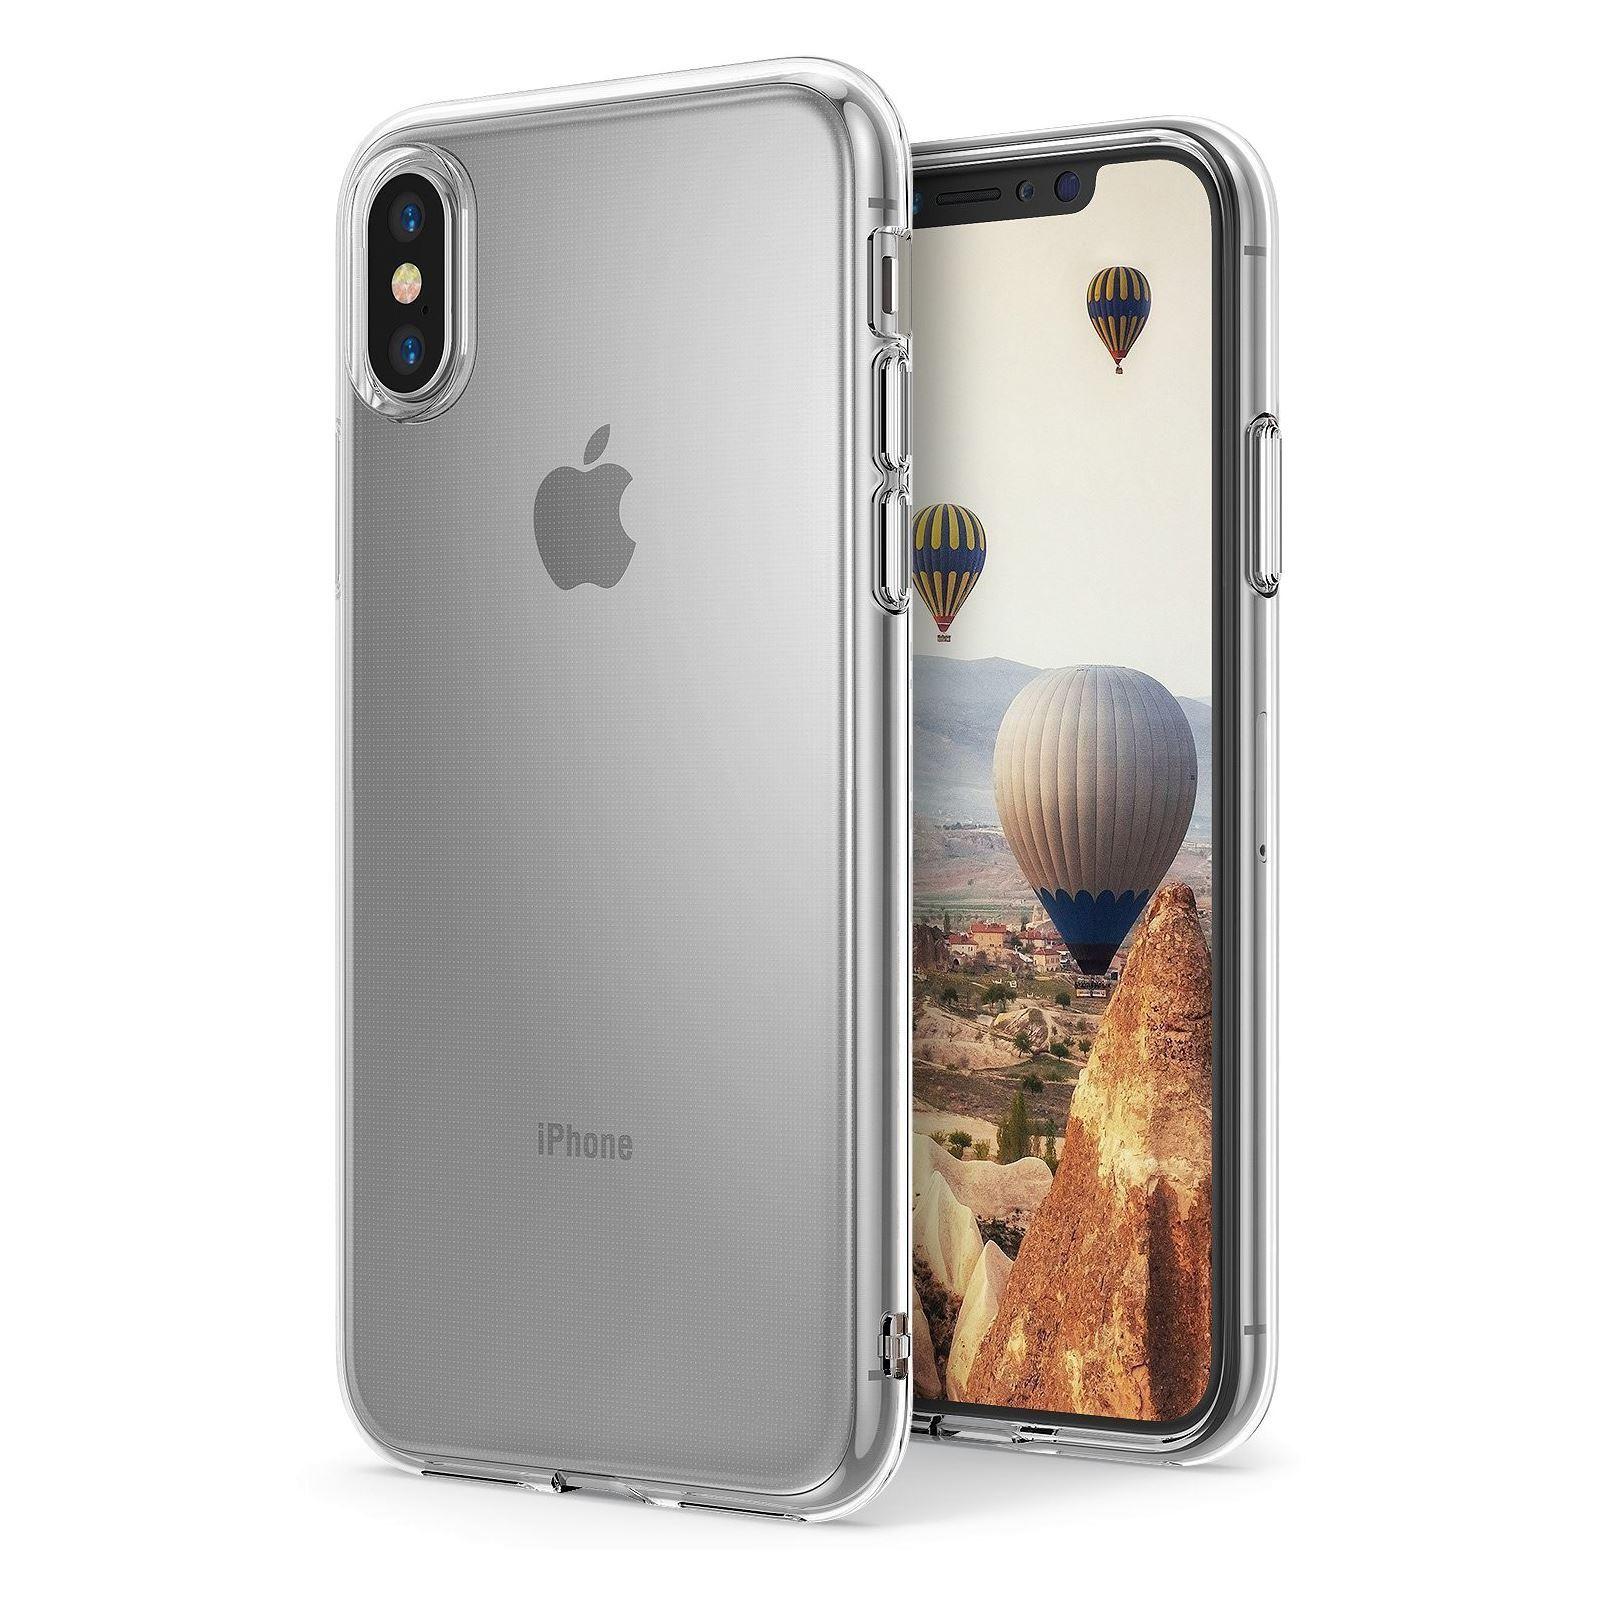 carcasa transparente iphone 5s